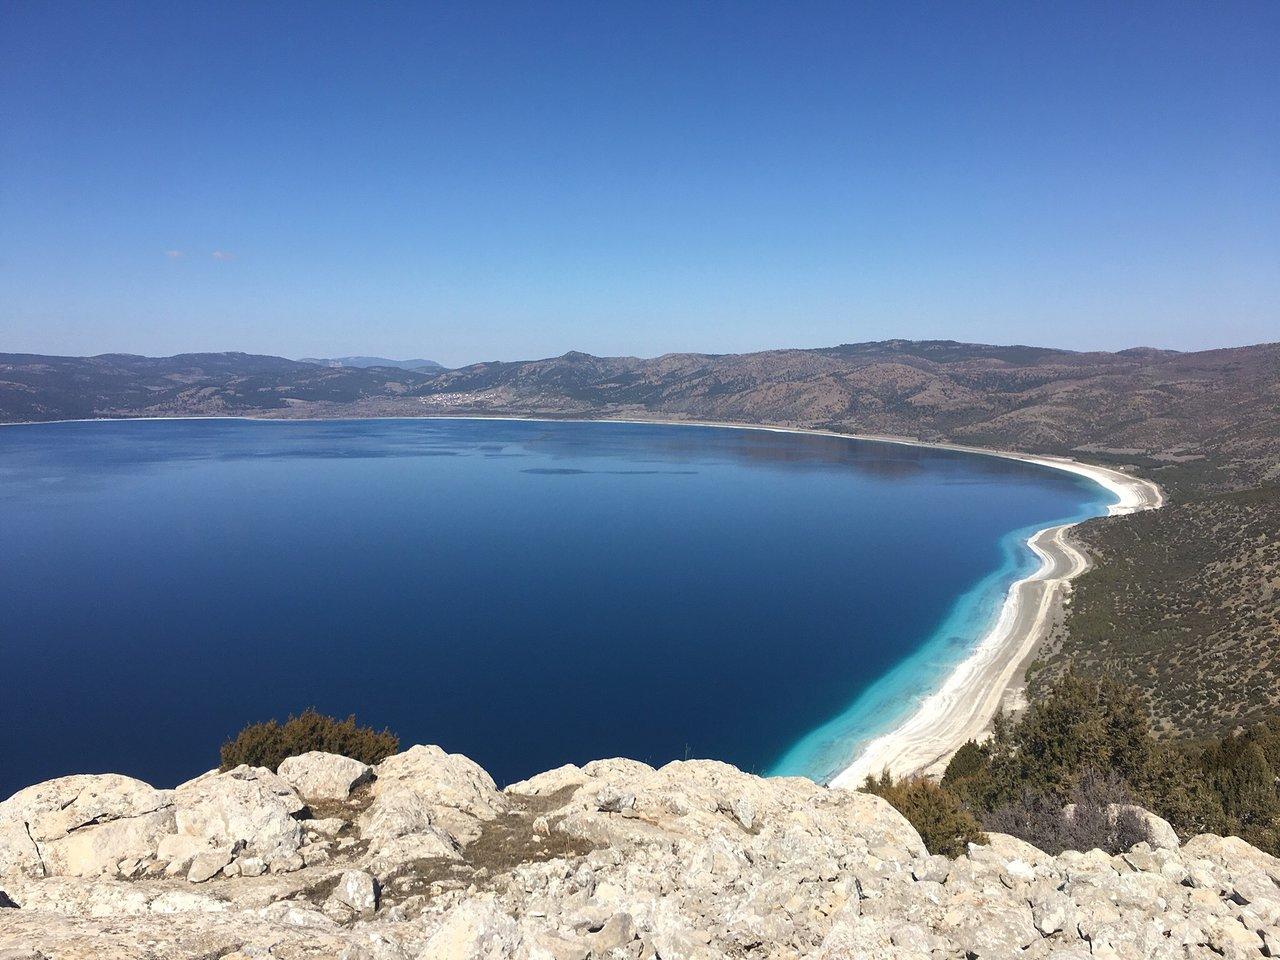 горное озеро Салда